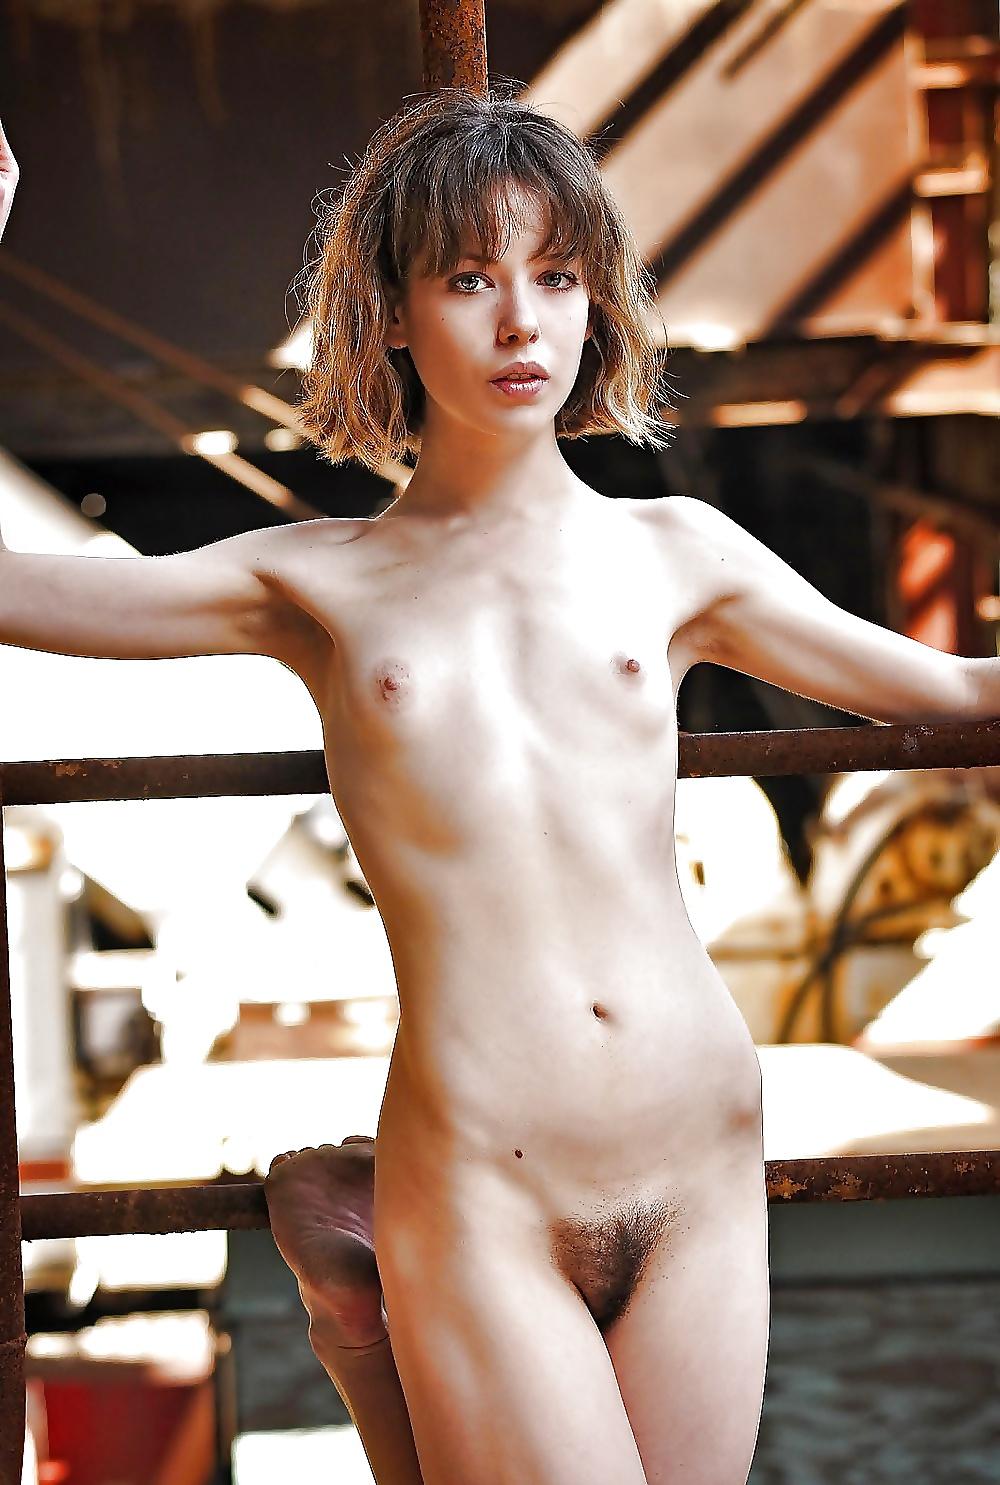 Skinny Petite Tiny Small Tits 8 - 49 Beelden Van Xhamstercom-8248